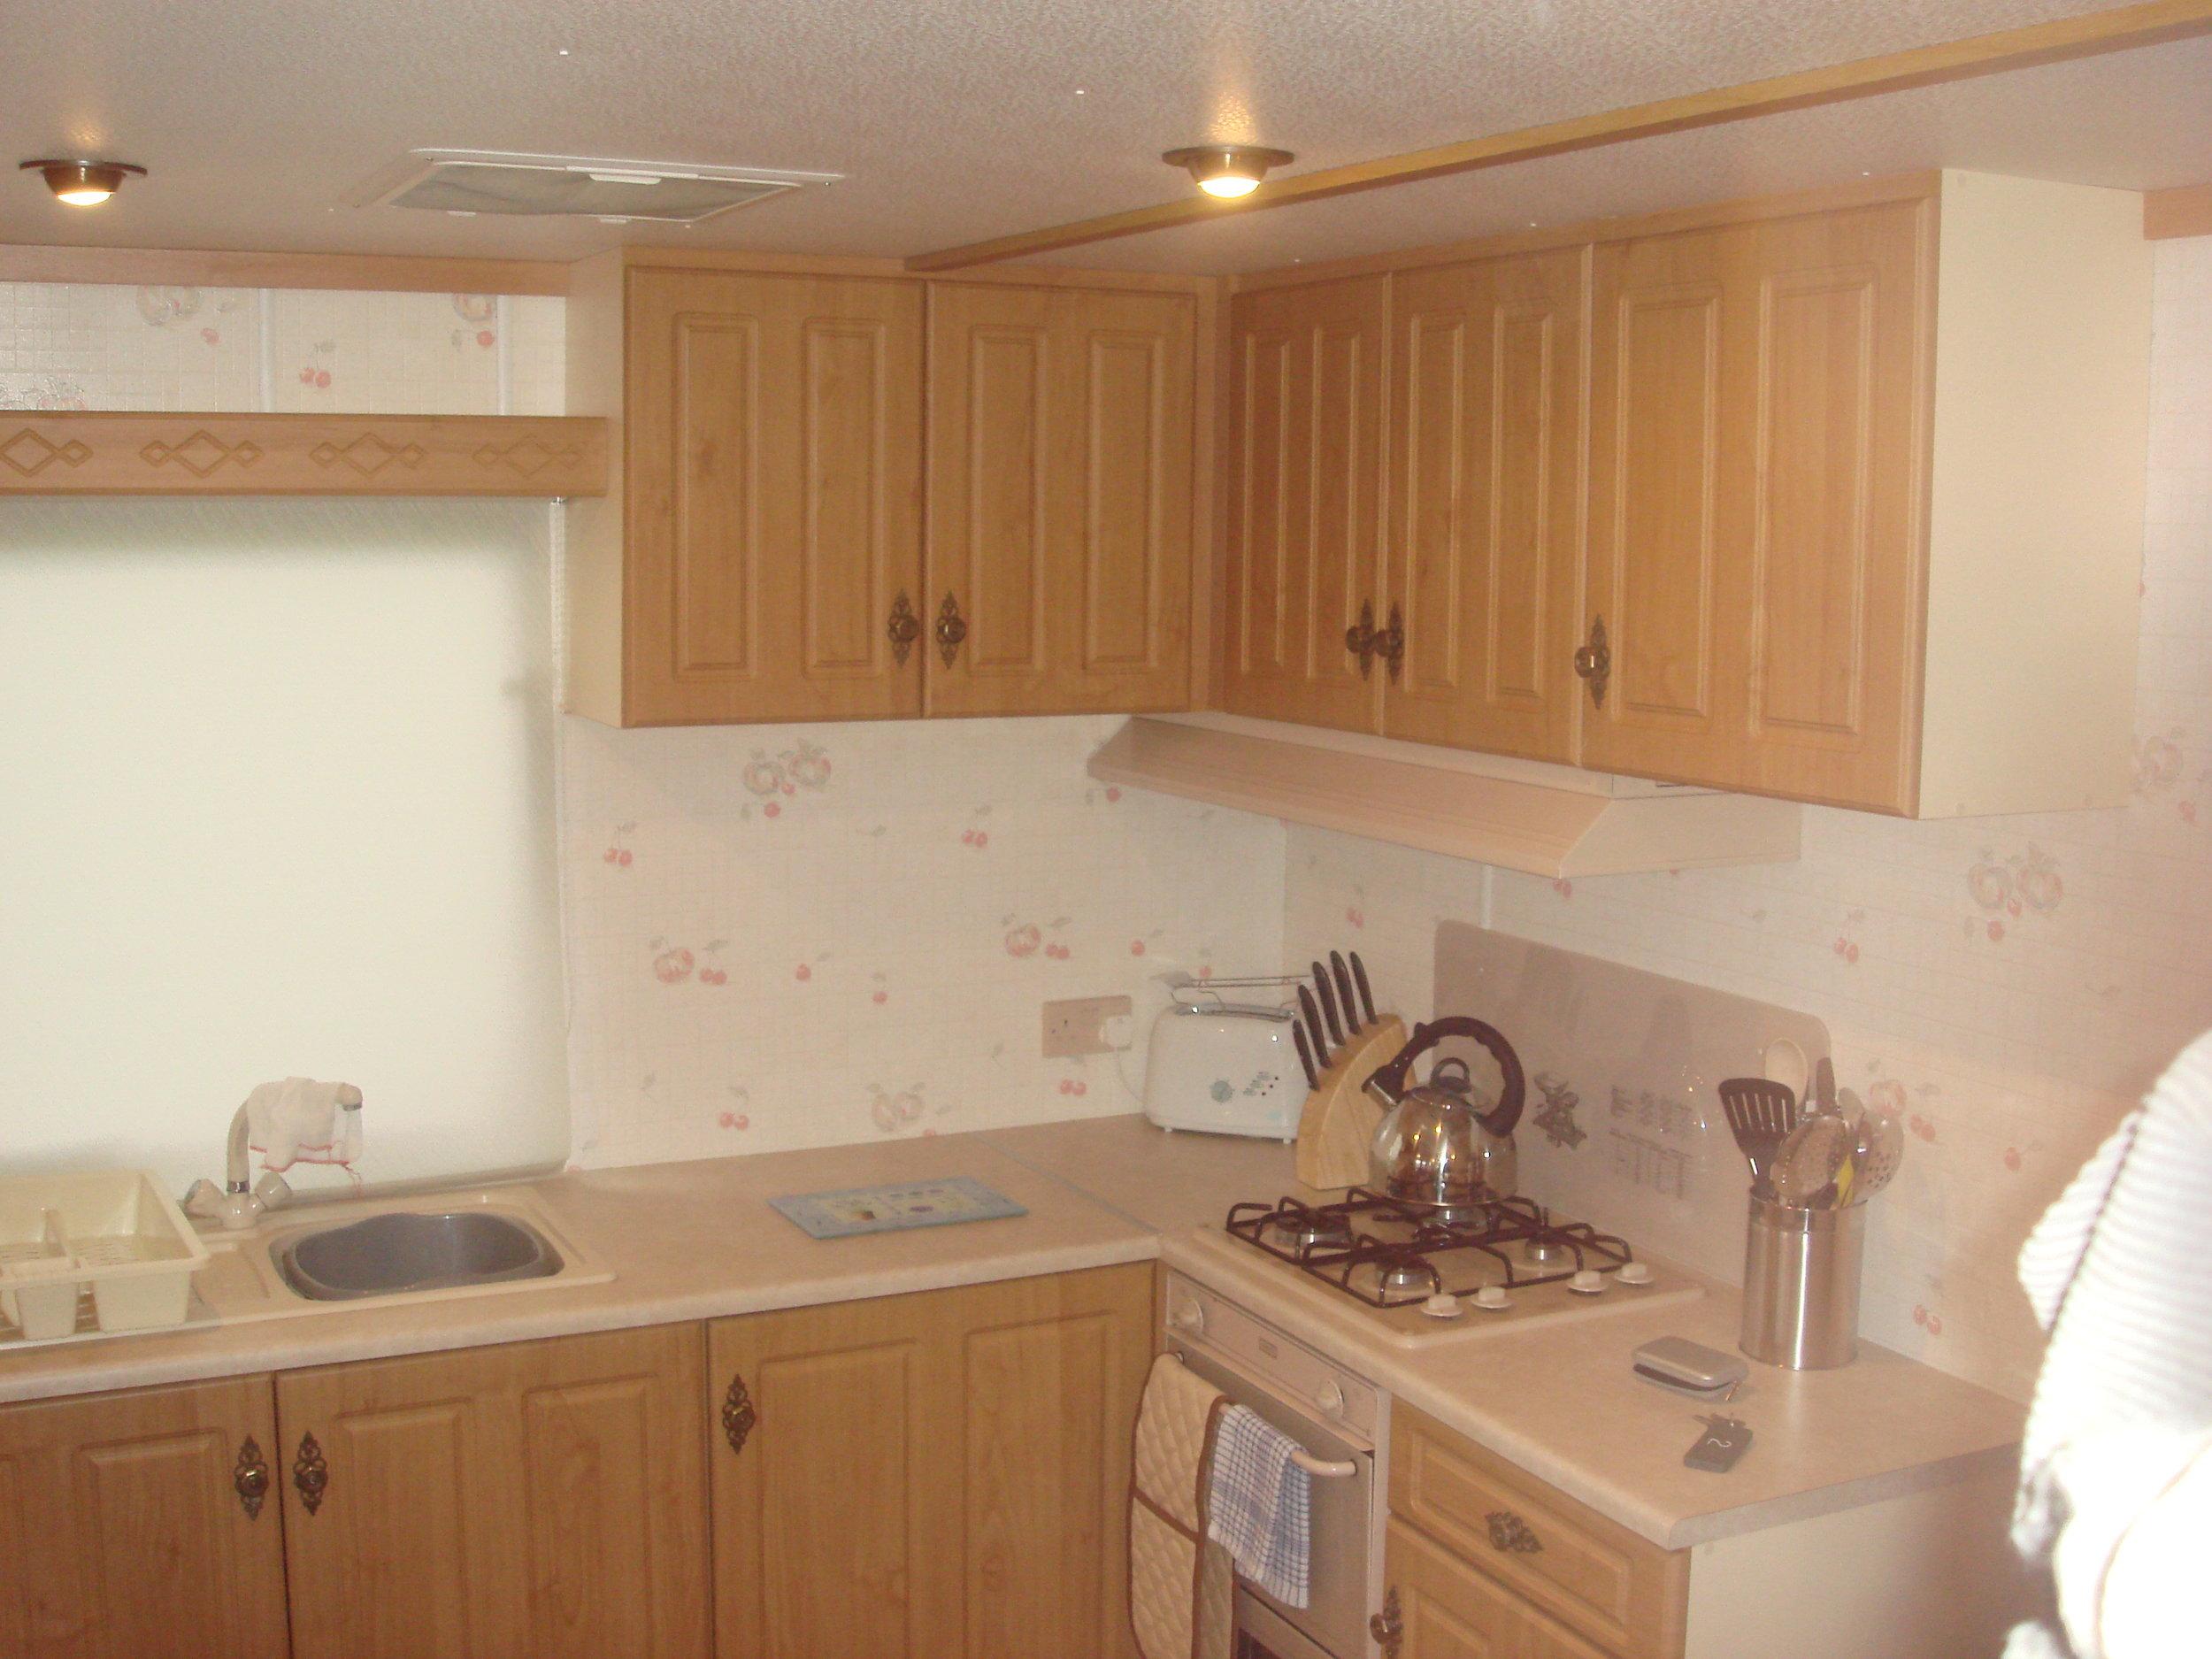 Kitchen - Caravan 2 Lorton Vale Caravans lortonvalecaravans.co.uk